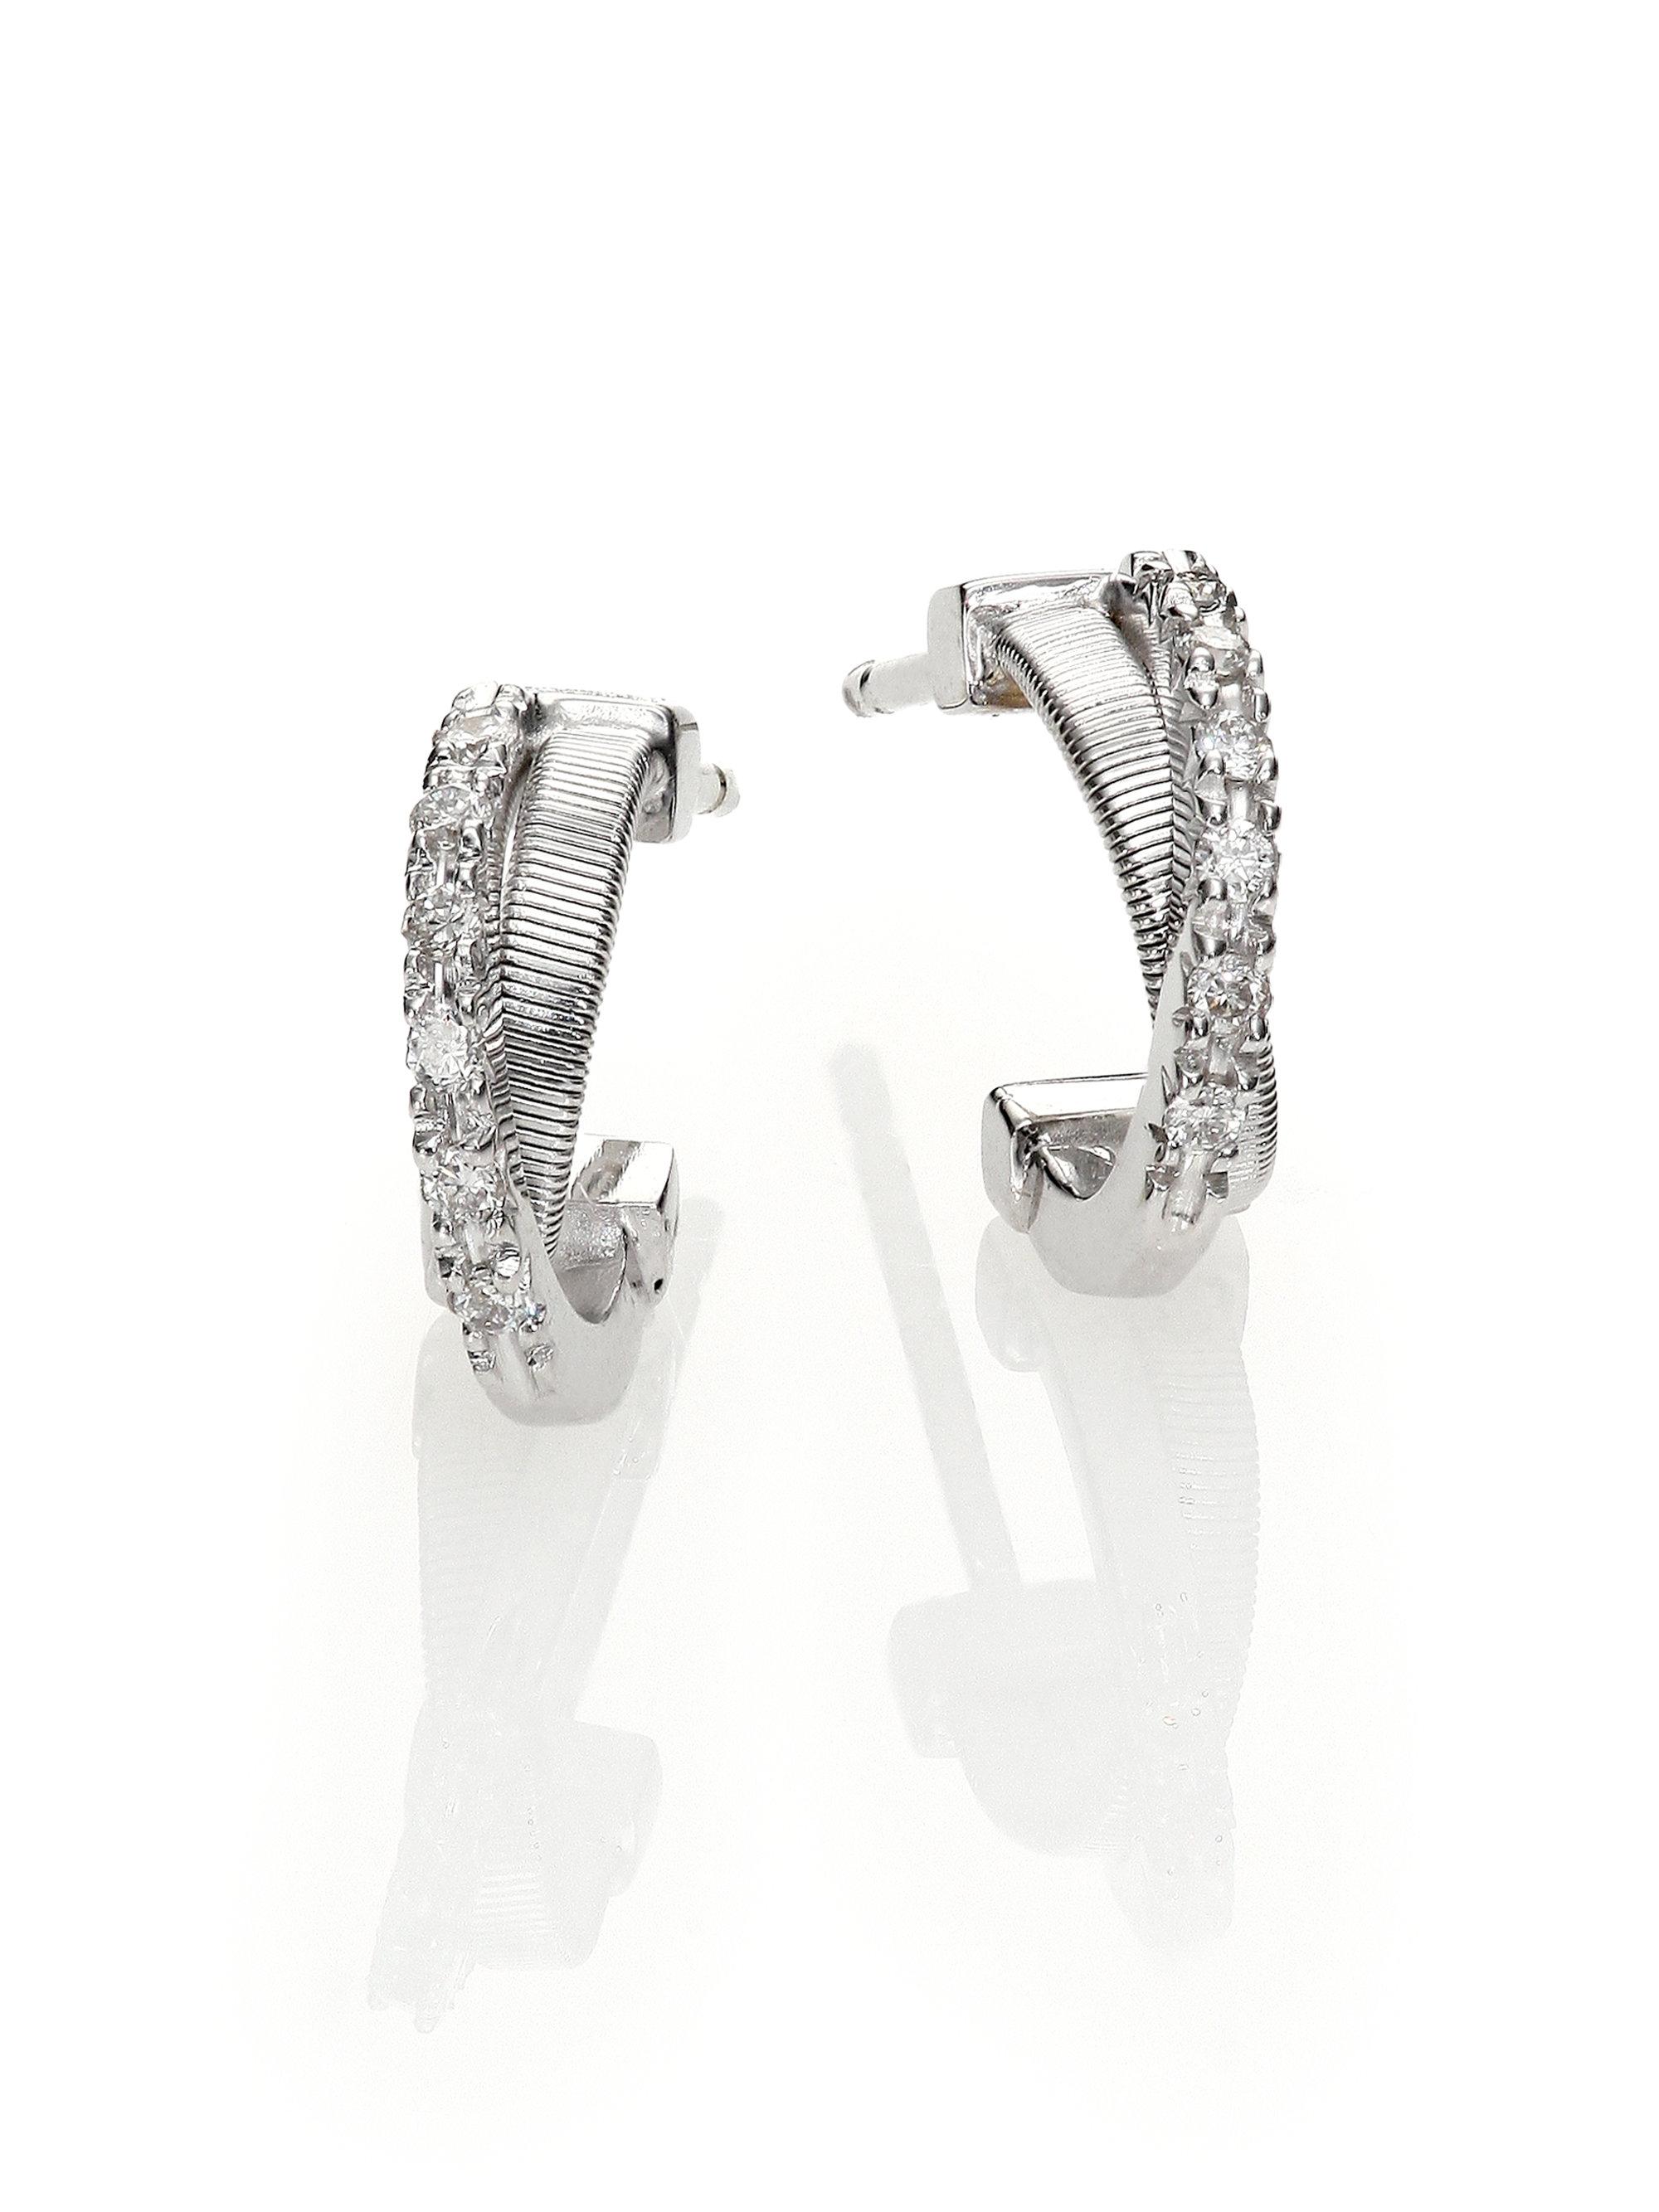 Marco bicego Goa Earrings Diamond & 18k White Gold Huggie Hoop